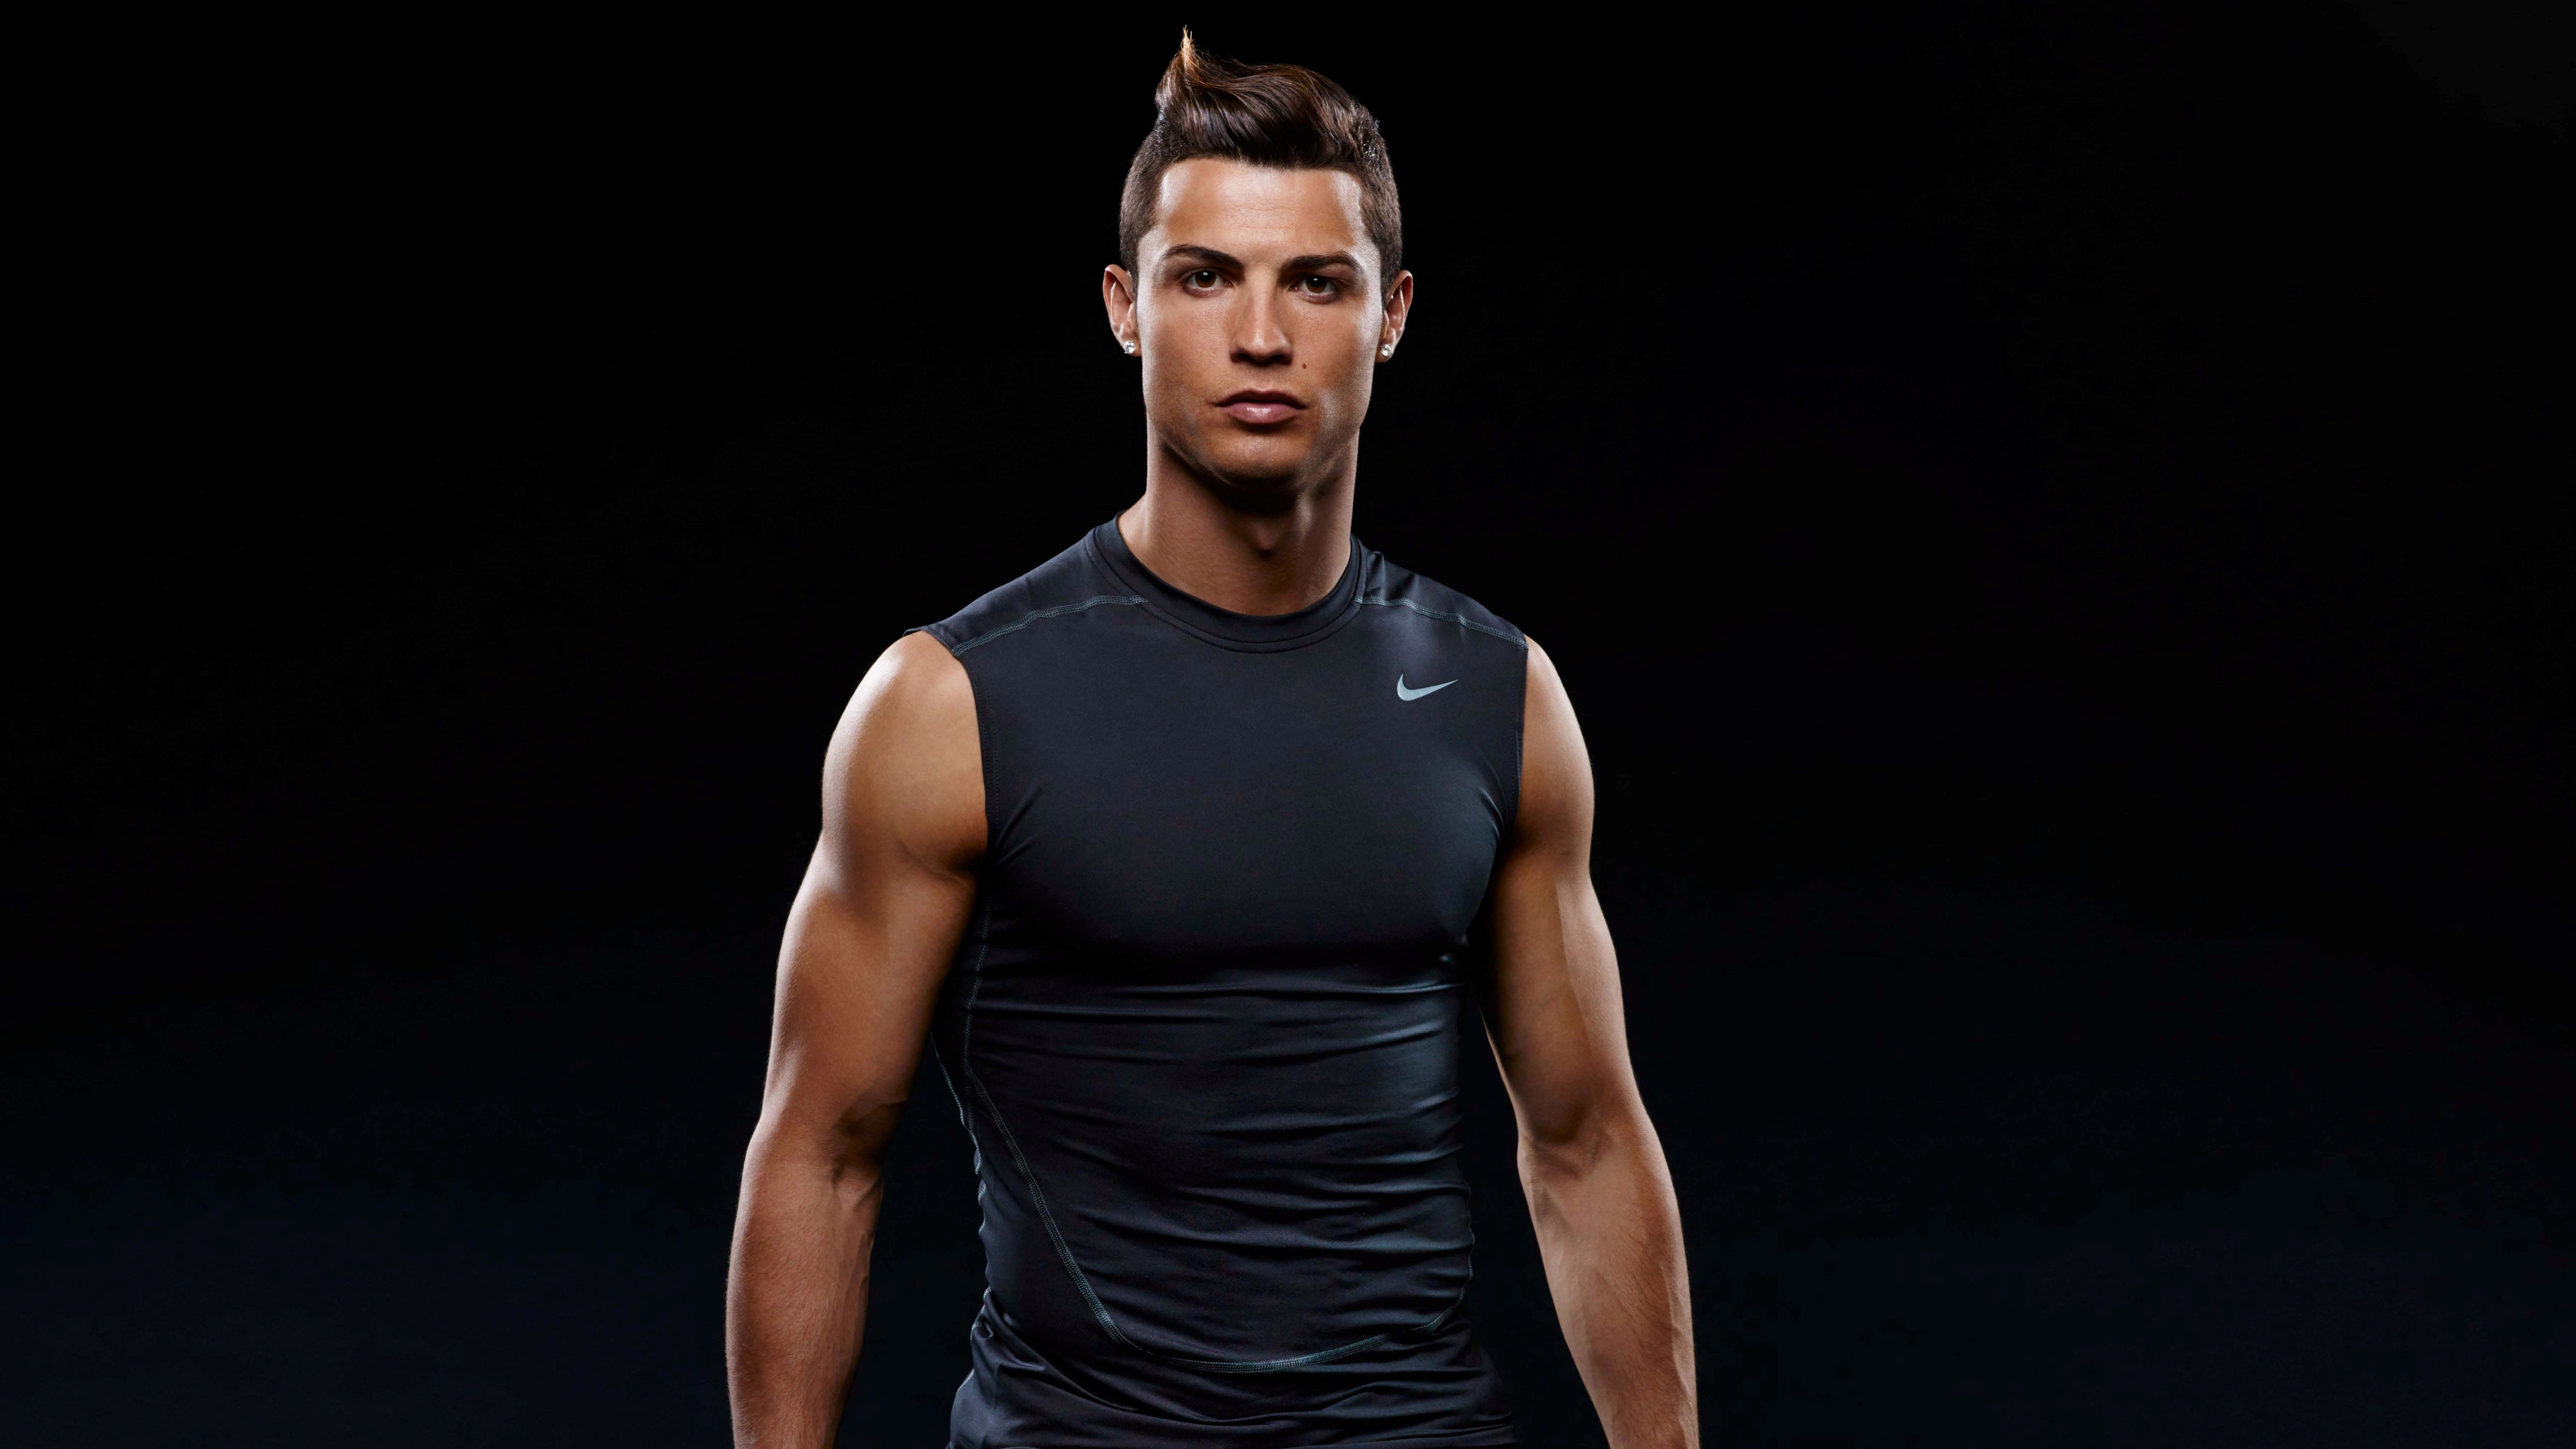 Wallpaper 4k Cristiano Ronaldo 4k New 4k wallpapers boys 3840x2160